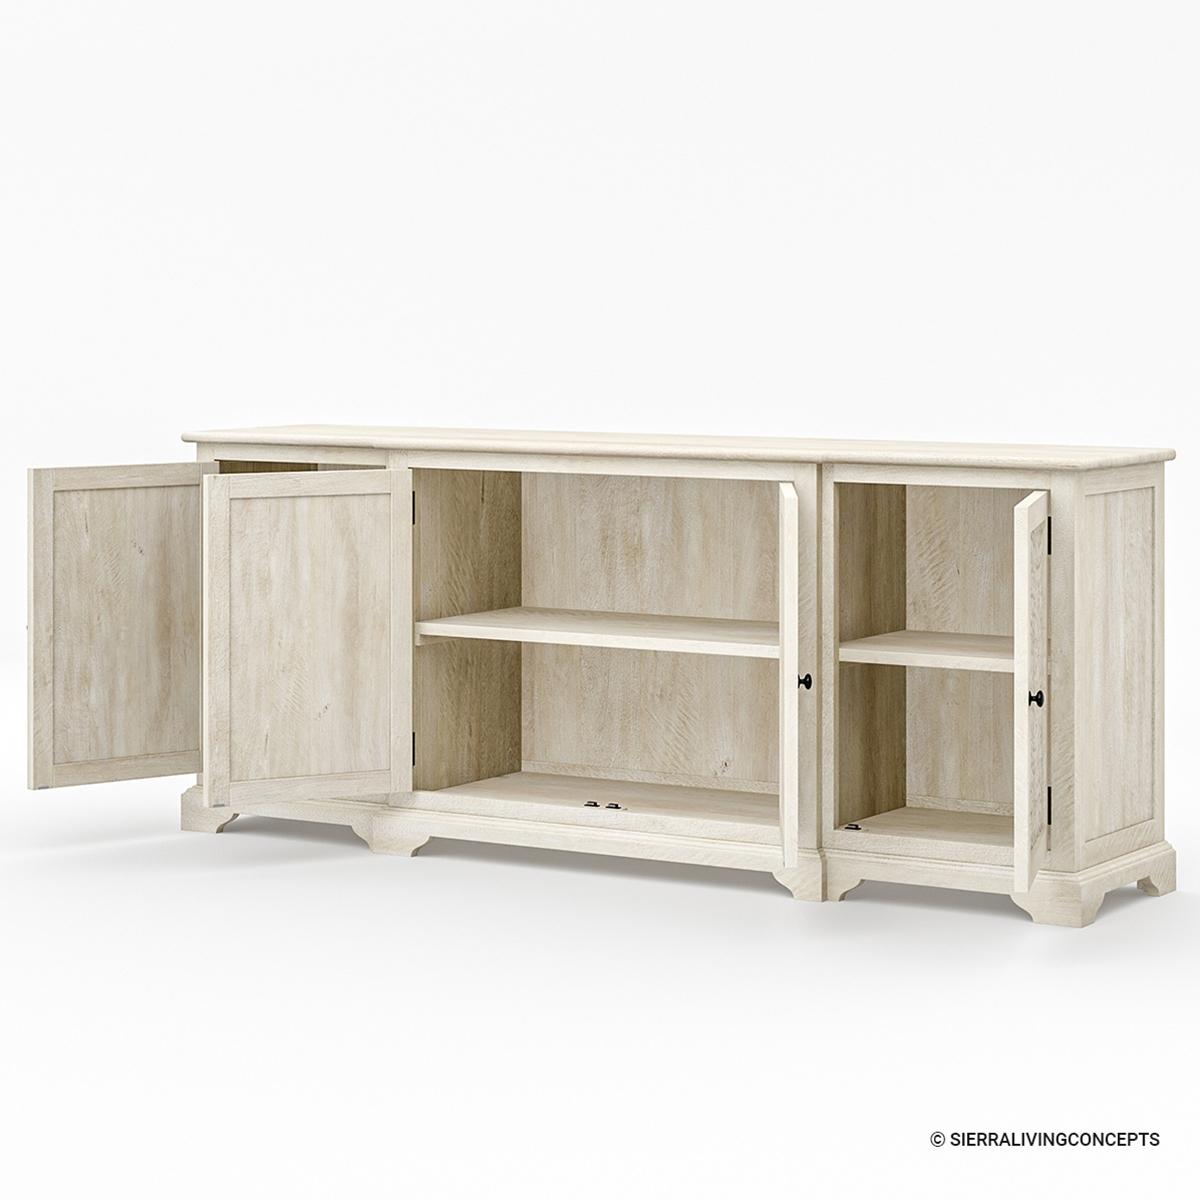 Calistoga Handcarved Mandala Art Weathered Solid Wood Large Buffet Cabinet